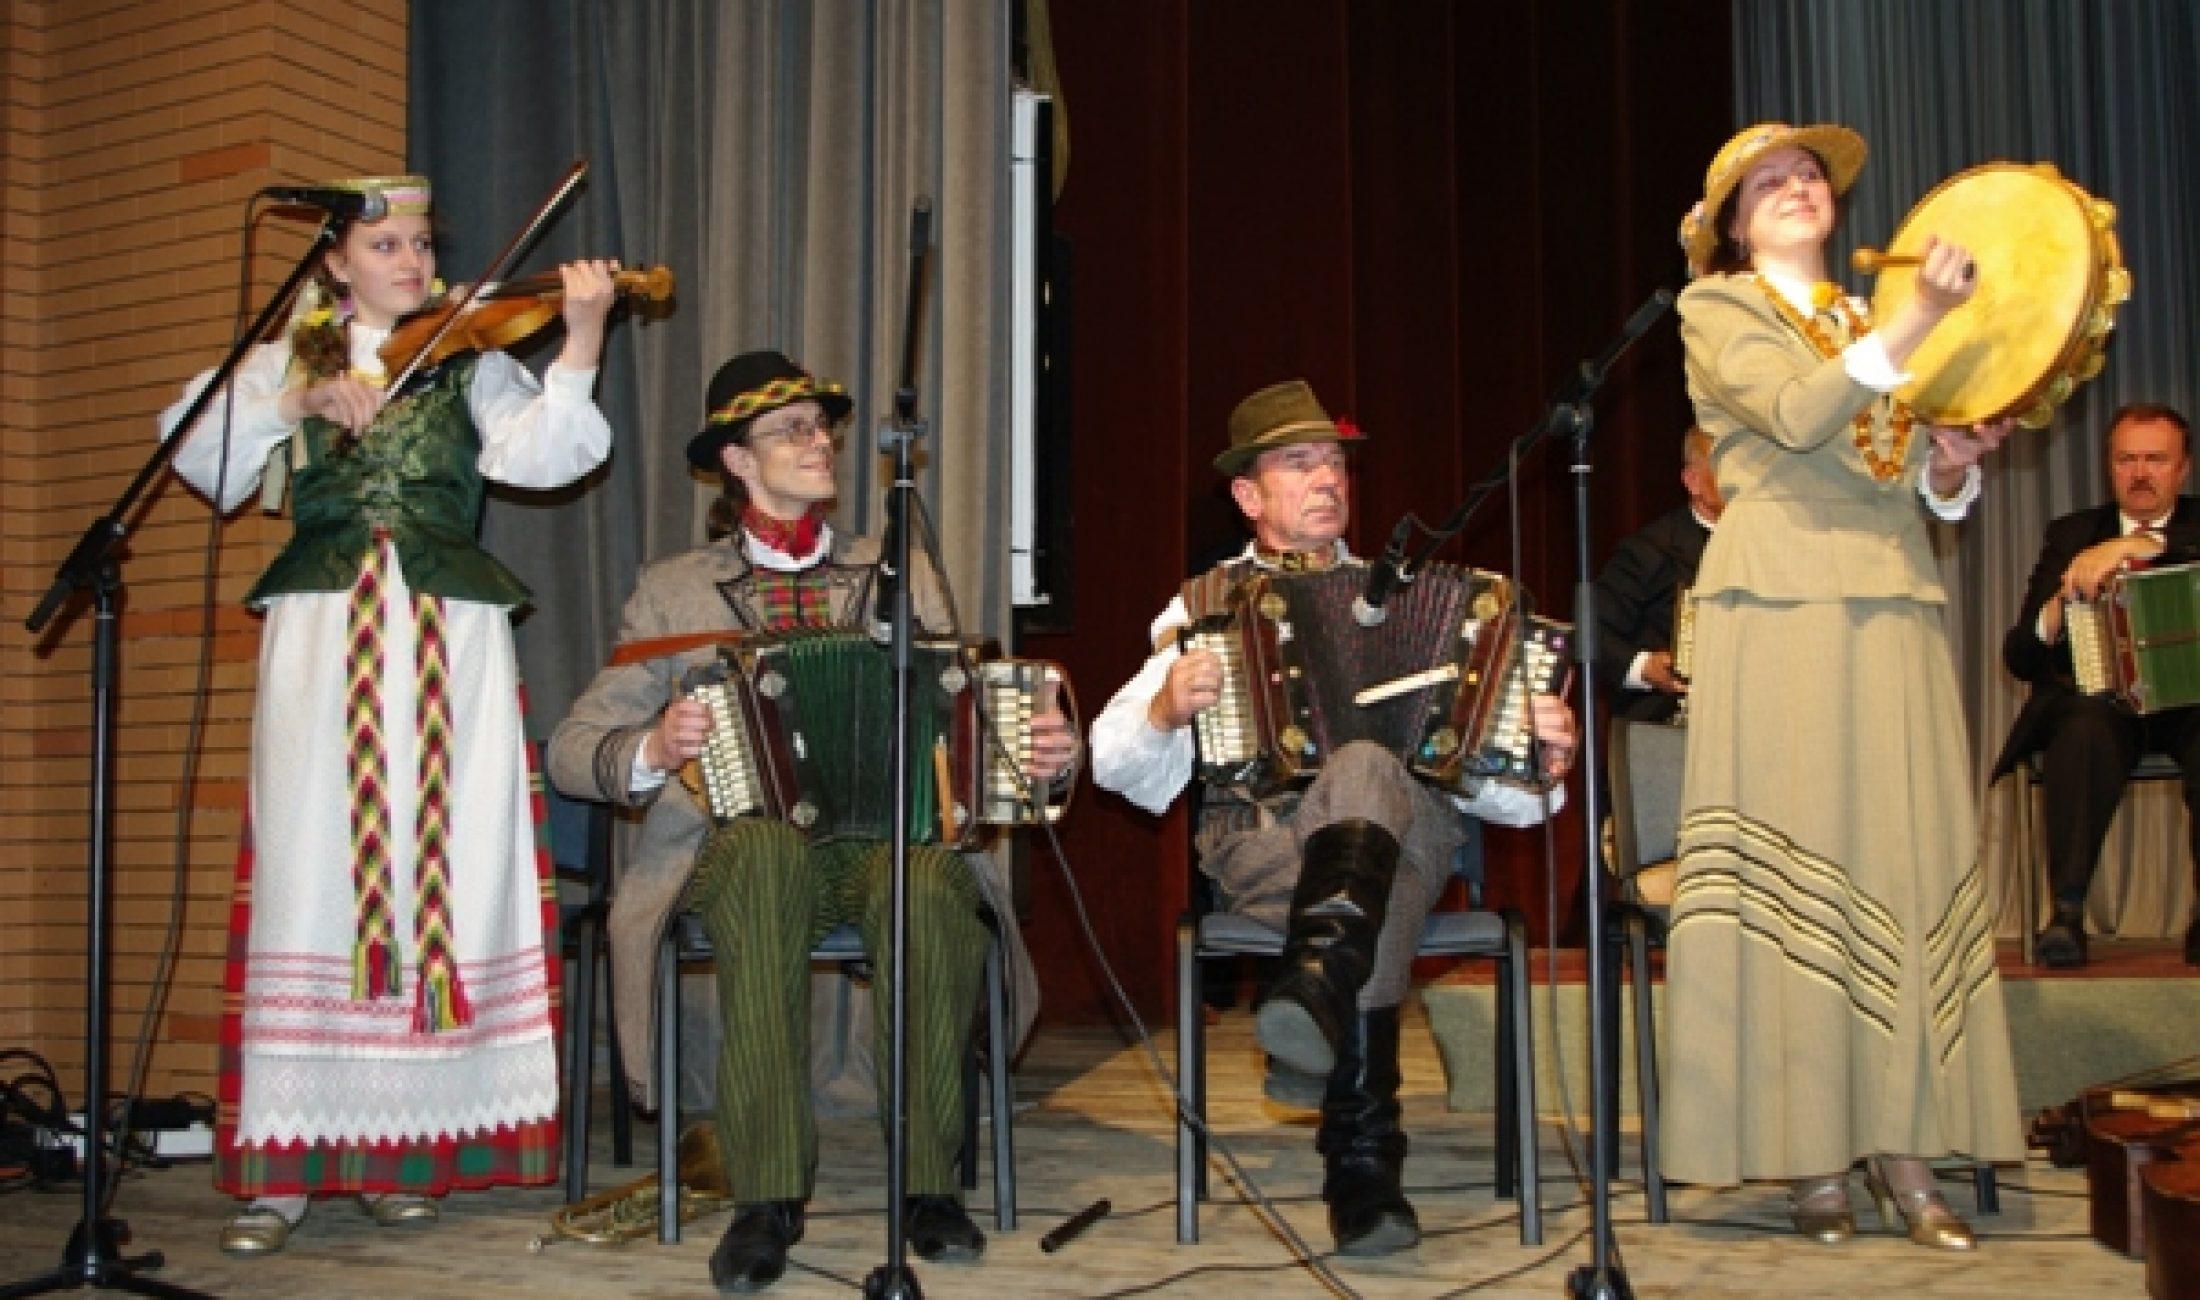 Latgolā nūtiks XX Latvejis tautys muzykys svātki